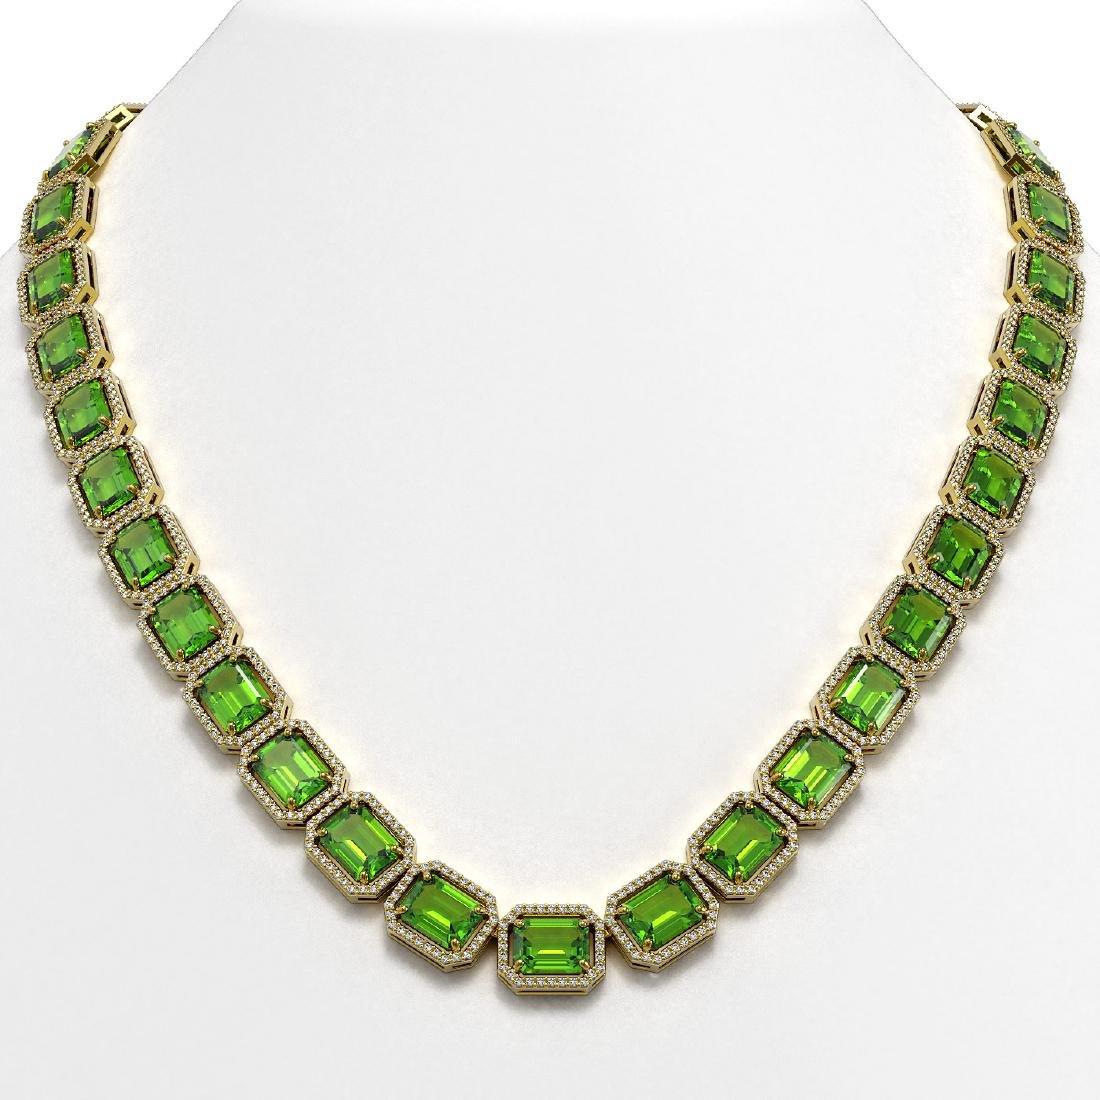 73.41 CTW Peridot & Diamond Halo Necklace 10K Yellow